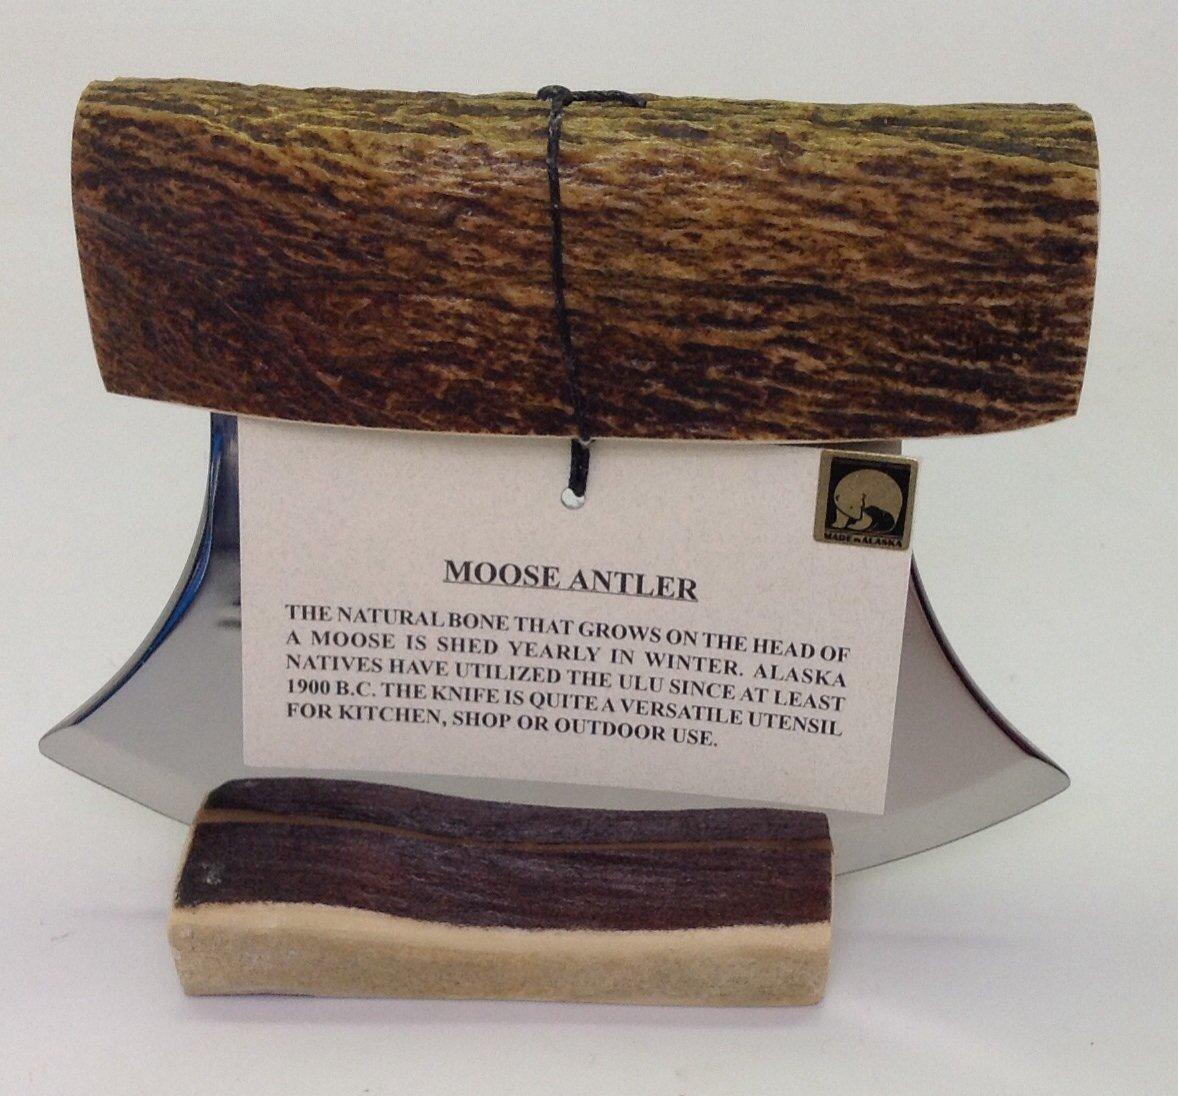 Made in Alaska Natural Moose Antler Ulu Knife